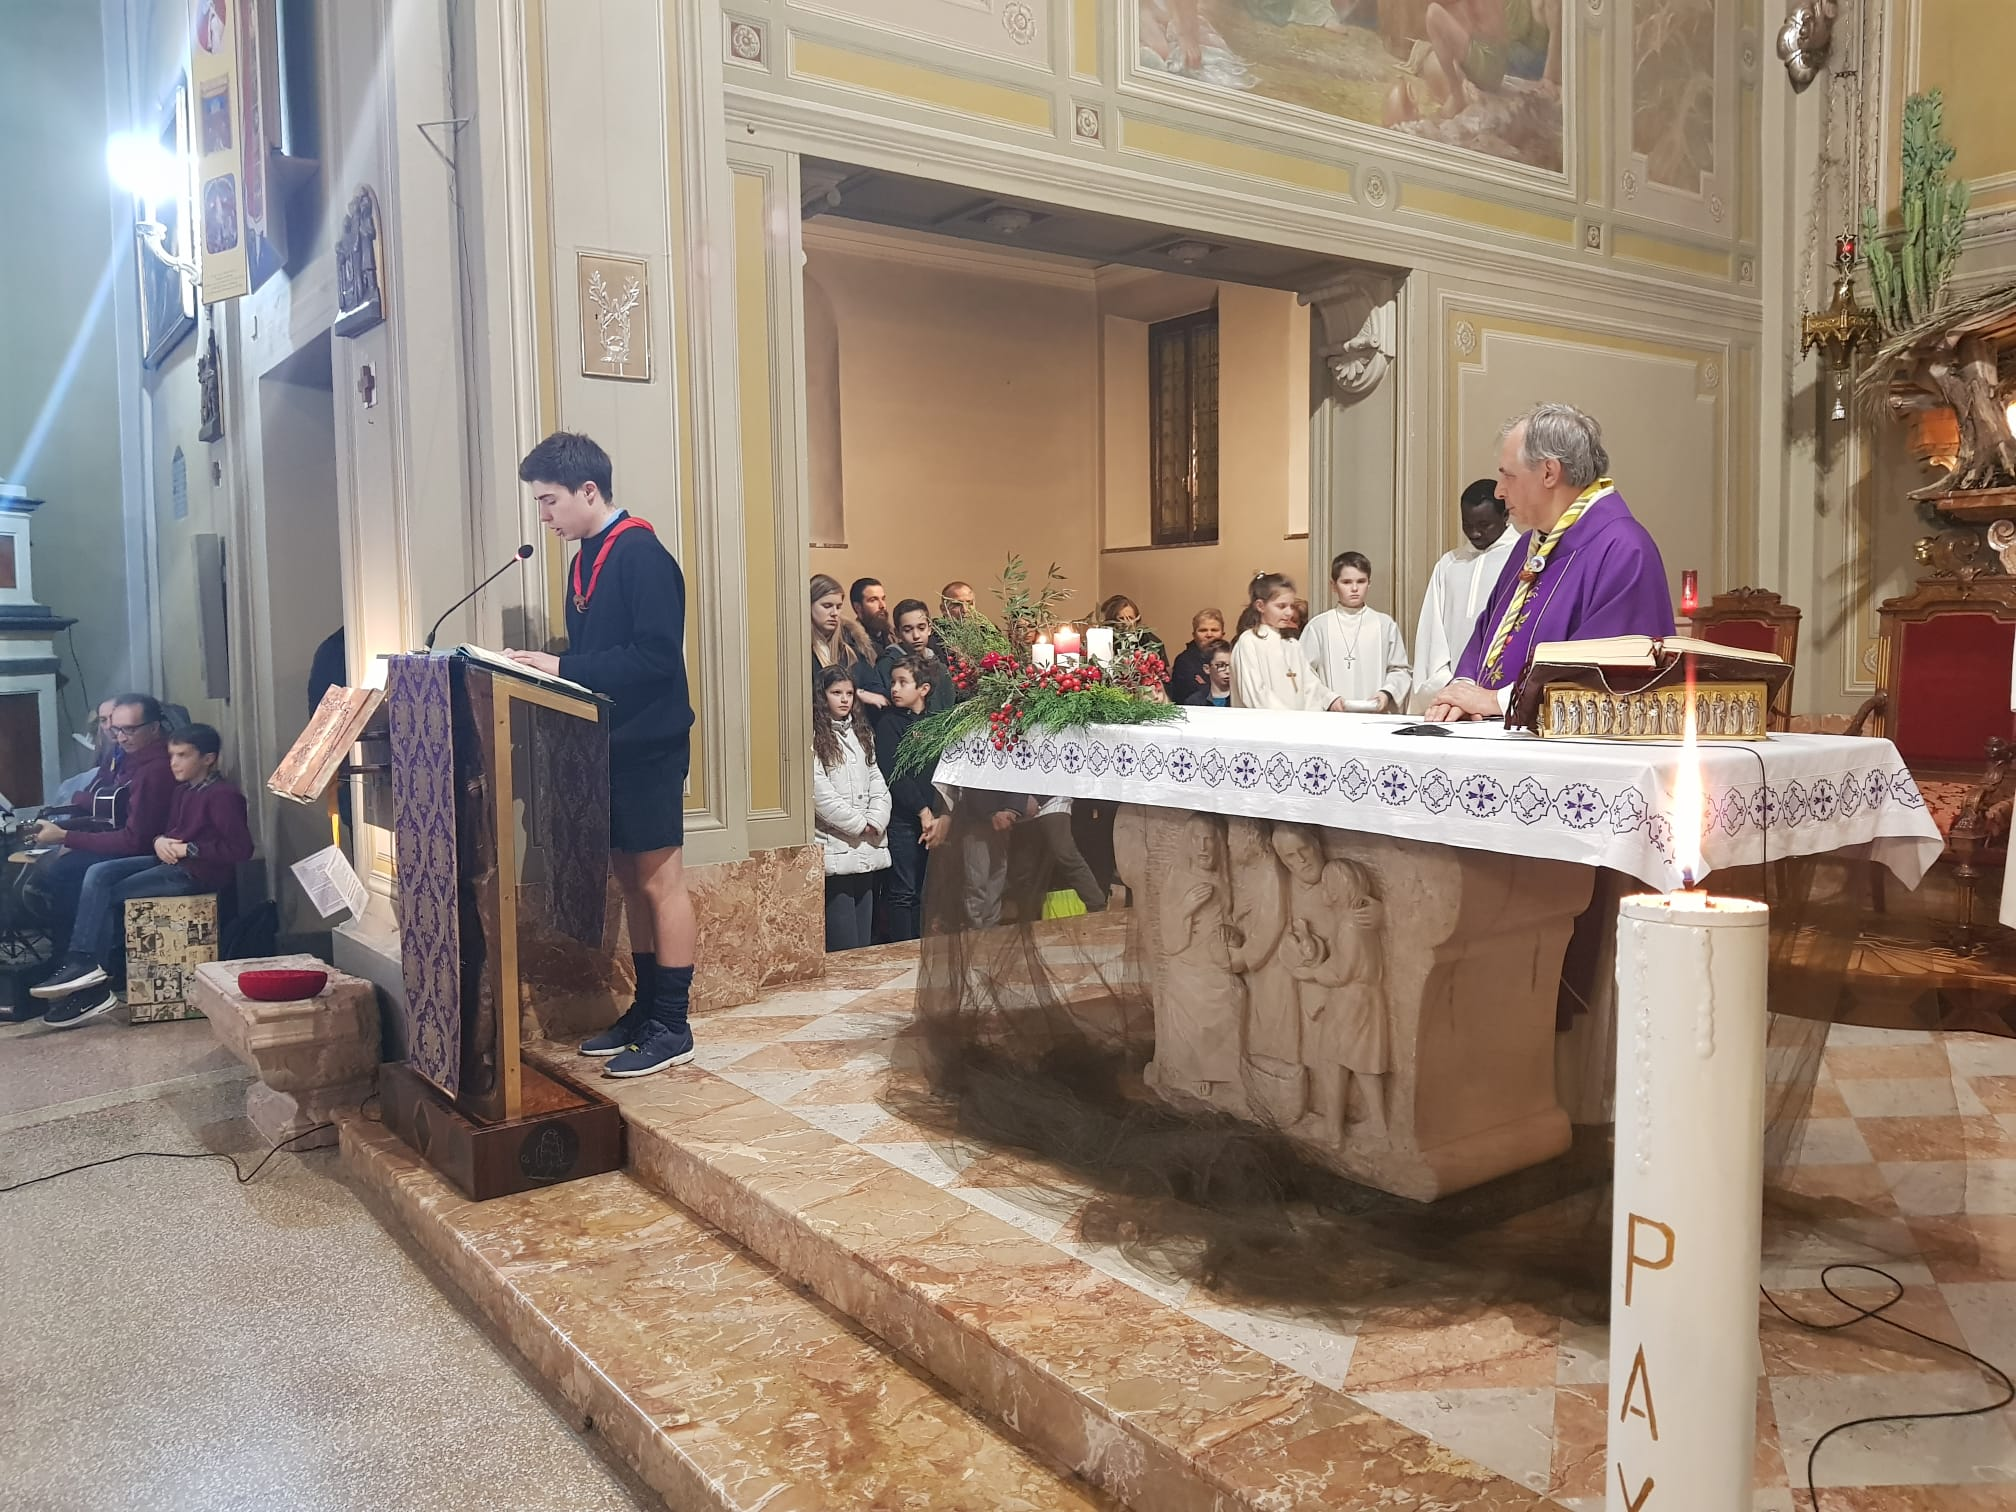 Luce di Betlemme 2019 santa messa (63)